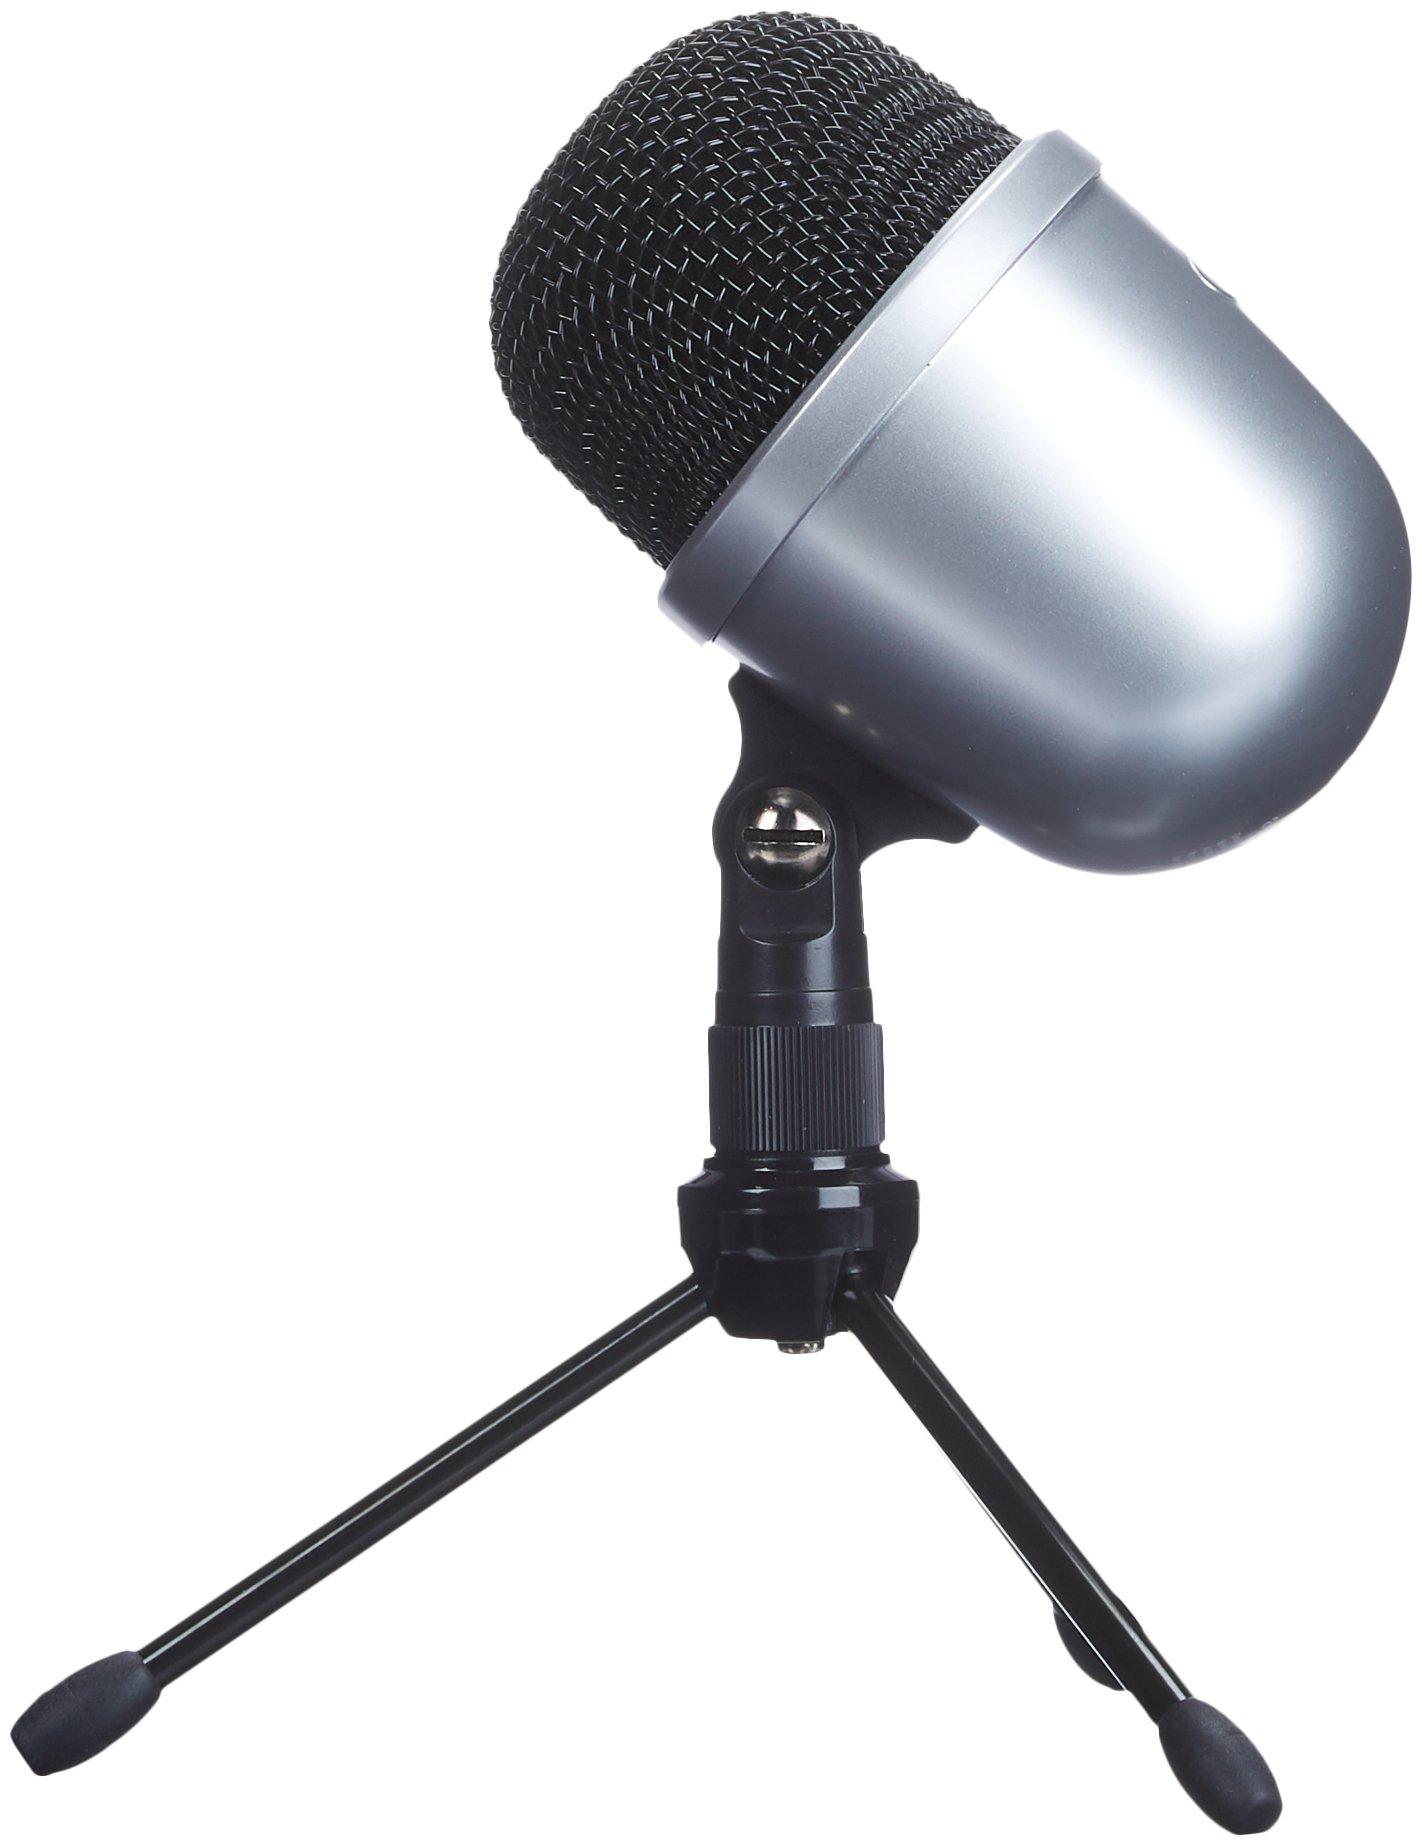 AmazonBasics Desktop Mini Condenser Microphone With Tripod - Silver by AmazonBasics (Image #1)